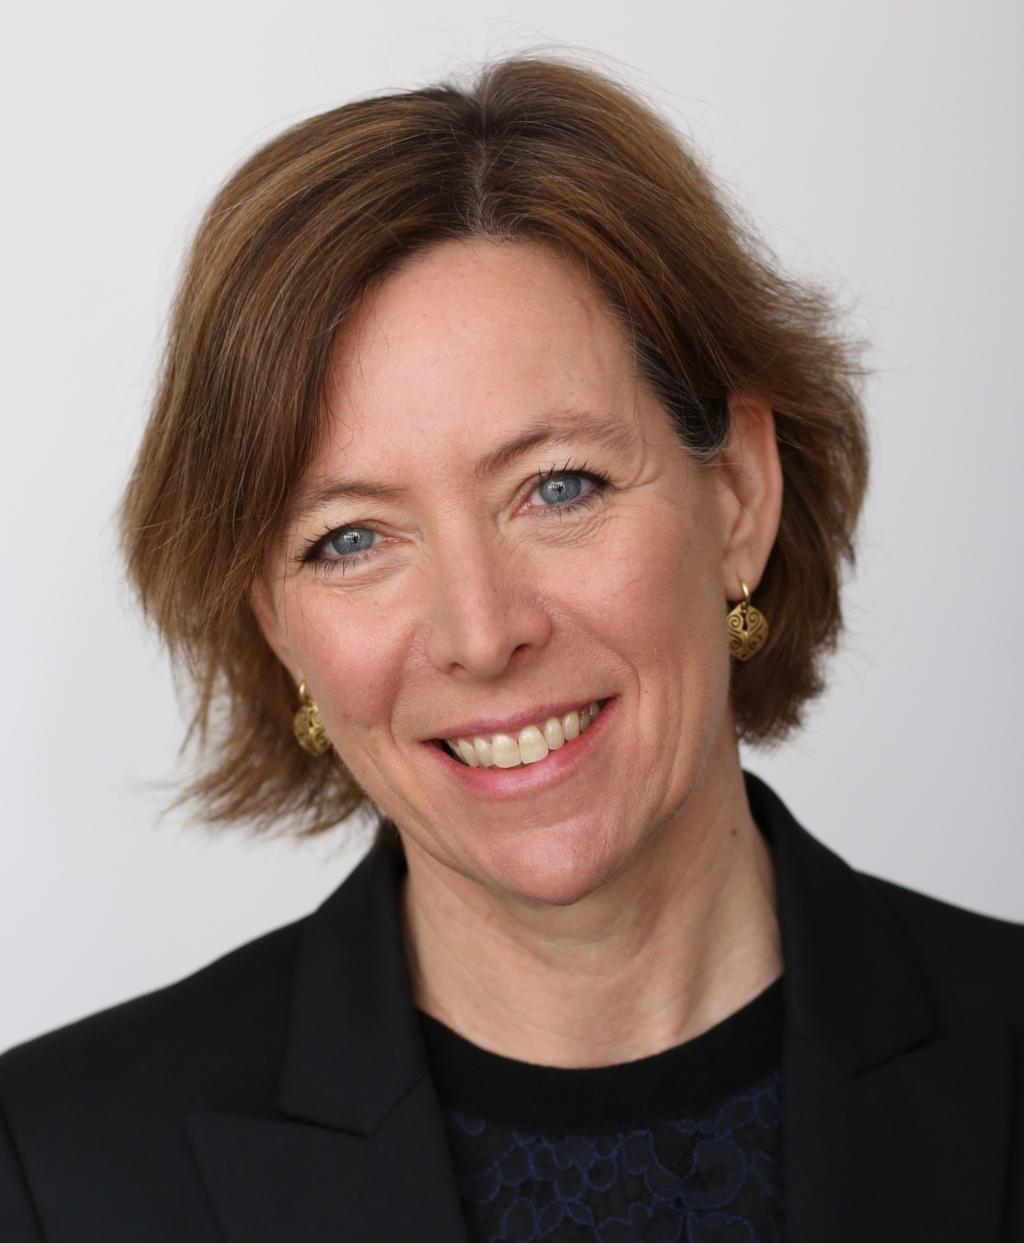 Charlotte Ersbøll